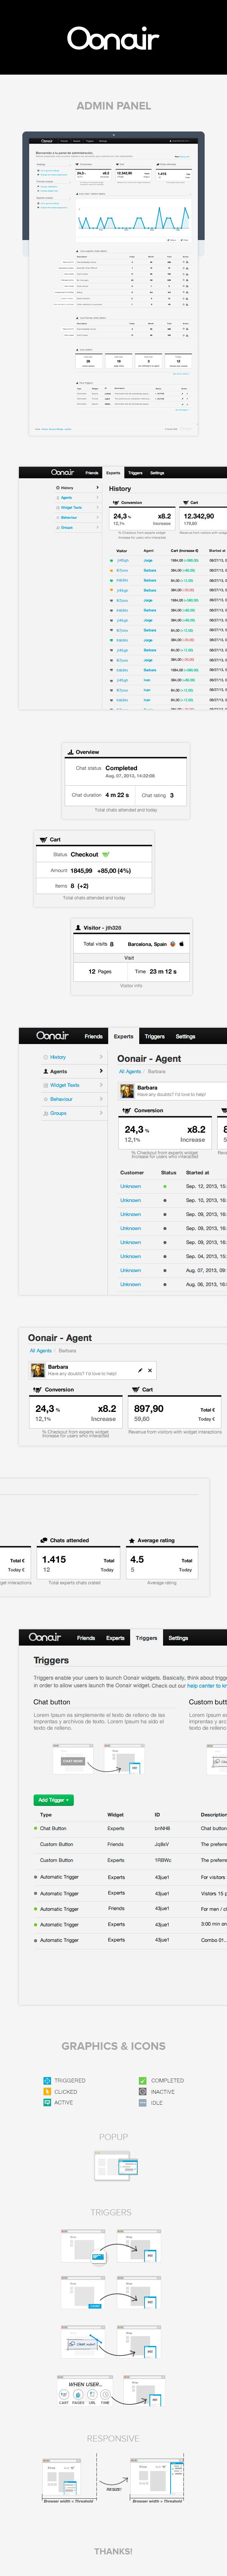 Webdesign ux UI admin panel bootstrap HTML/CSS/JS